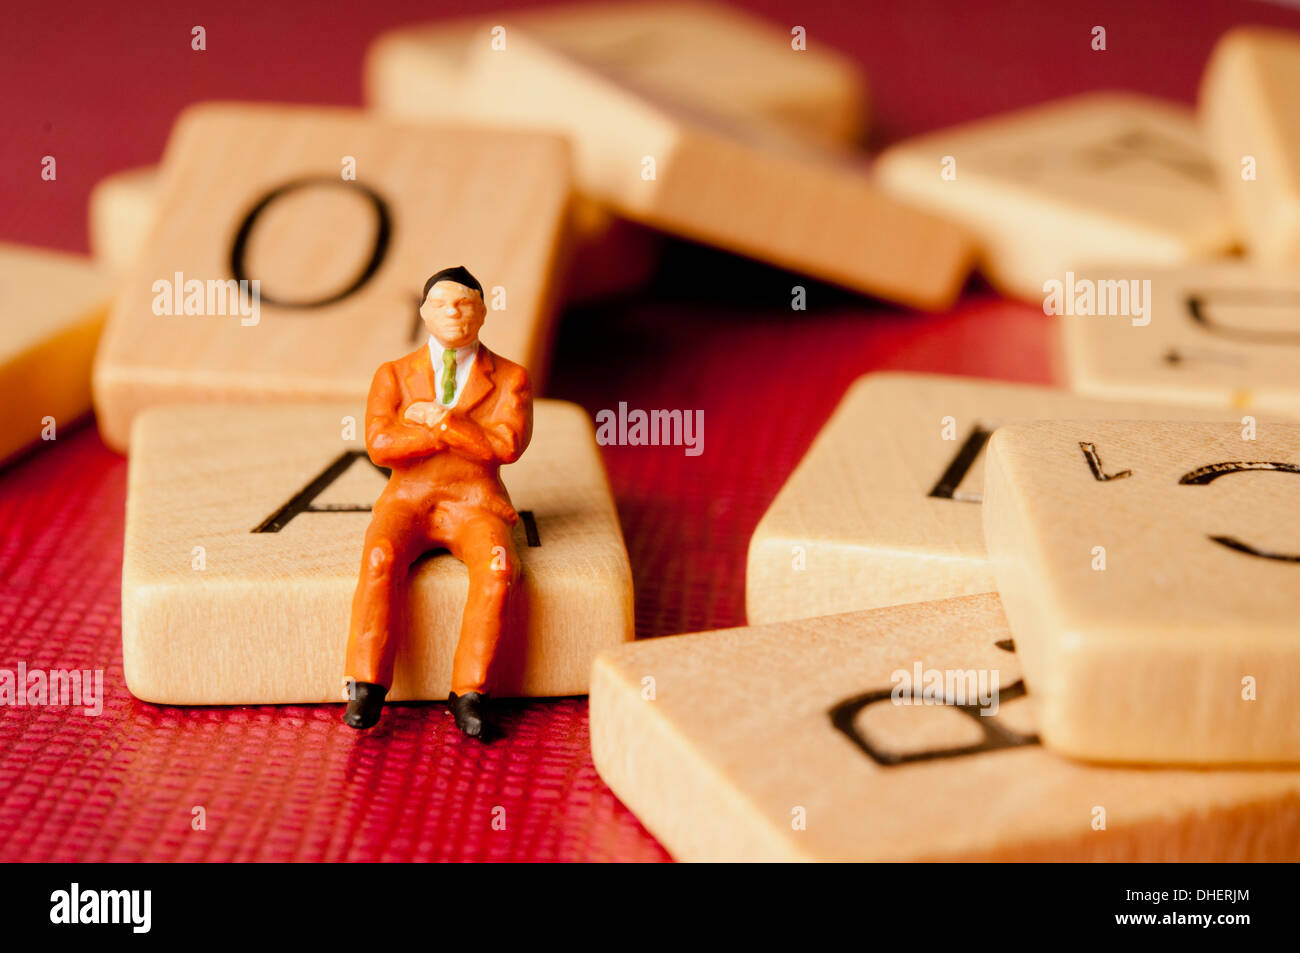 man figurine sitting on scrabble letter - Stock Image